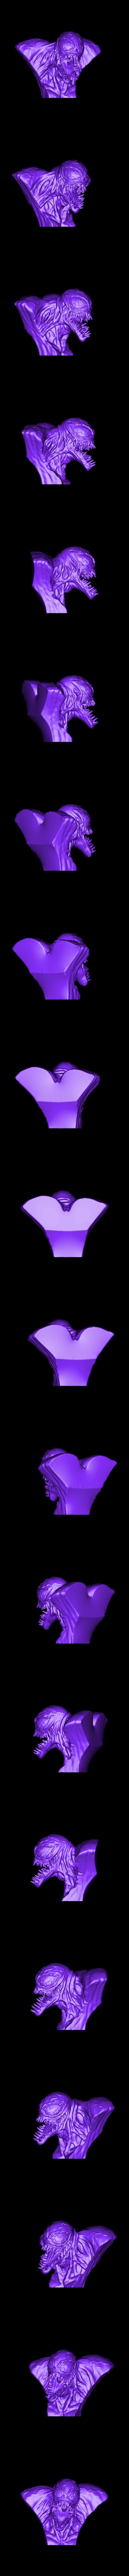 VenomBUST.stl Download STL file Venom Bust - Marvel 3D print model • 3D printable design, Bstar3Dart